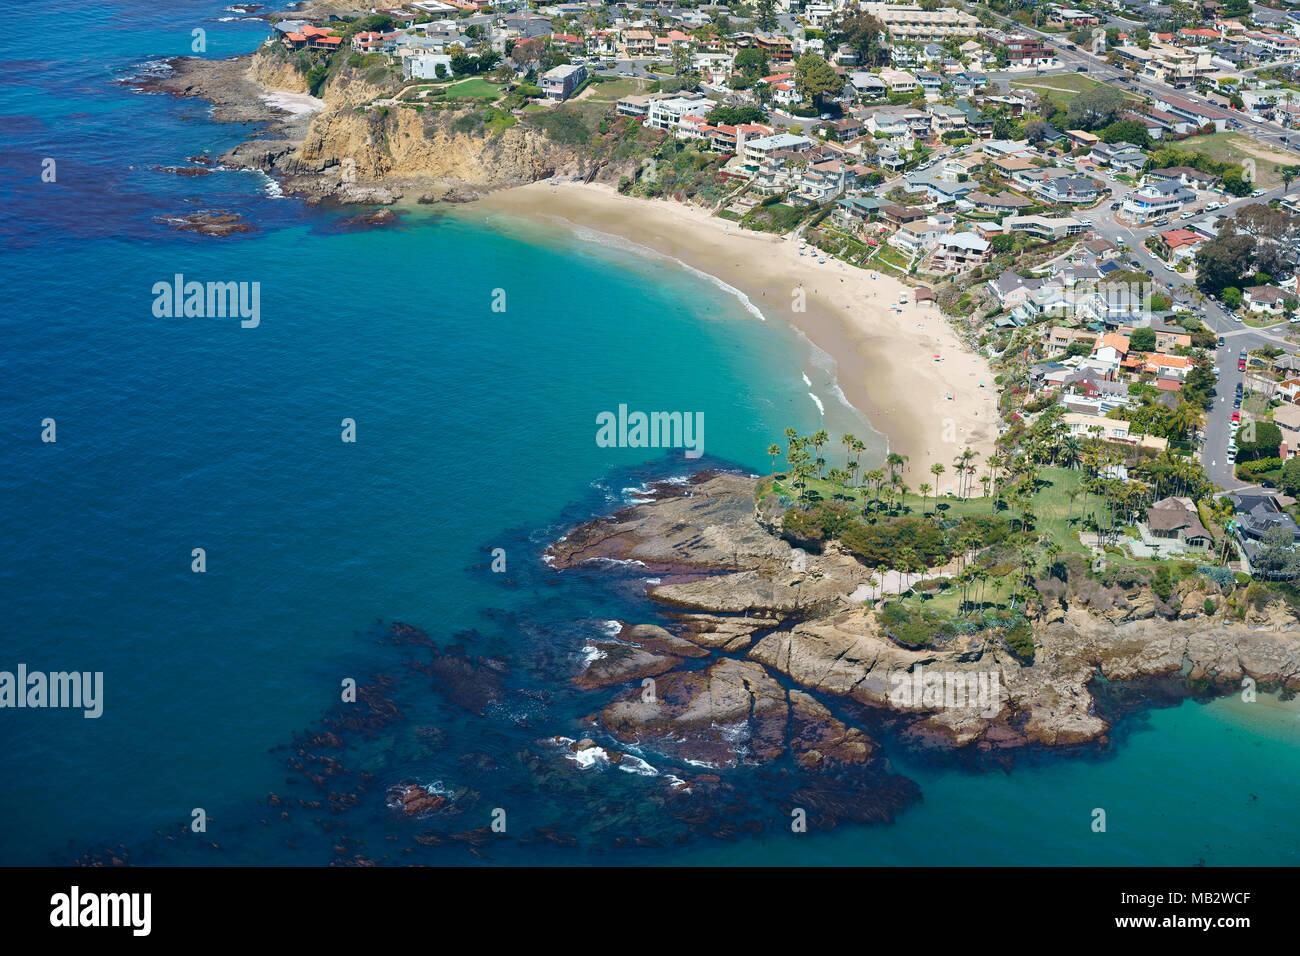 JAGGED COASTLINE AROUND CRESCENT BAY AND TWIN POINTS (aerial view). Laguna Beach, Orange County, California, USA. - Stock Image